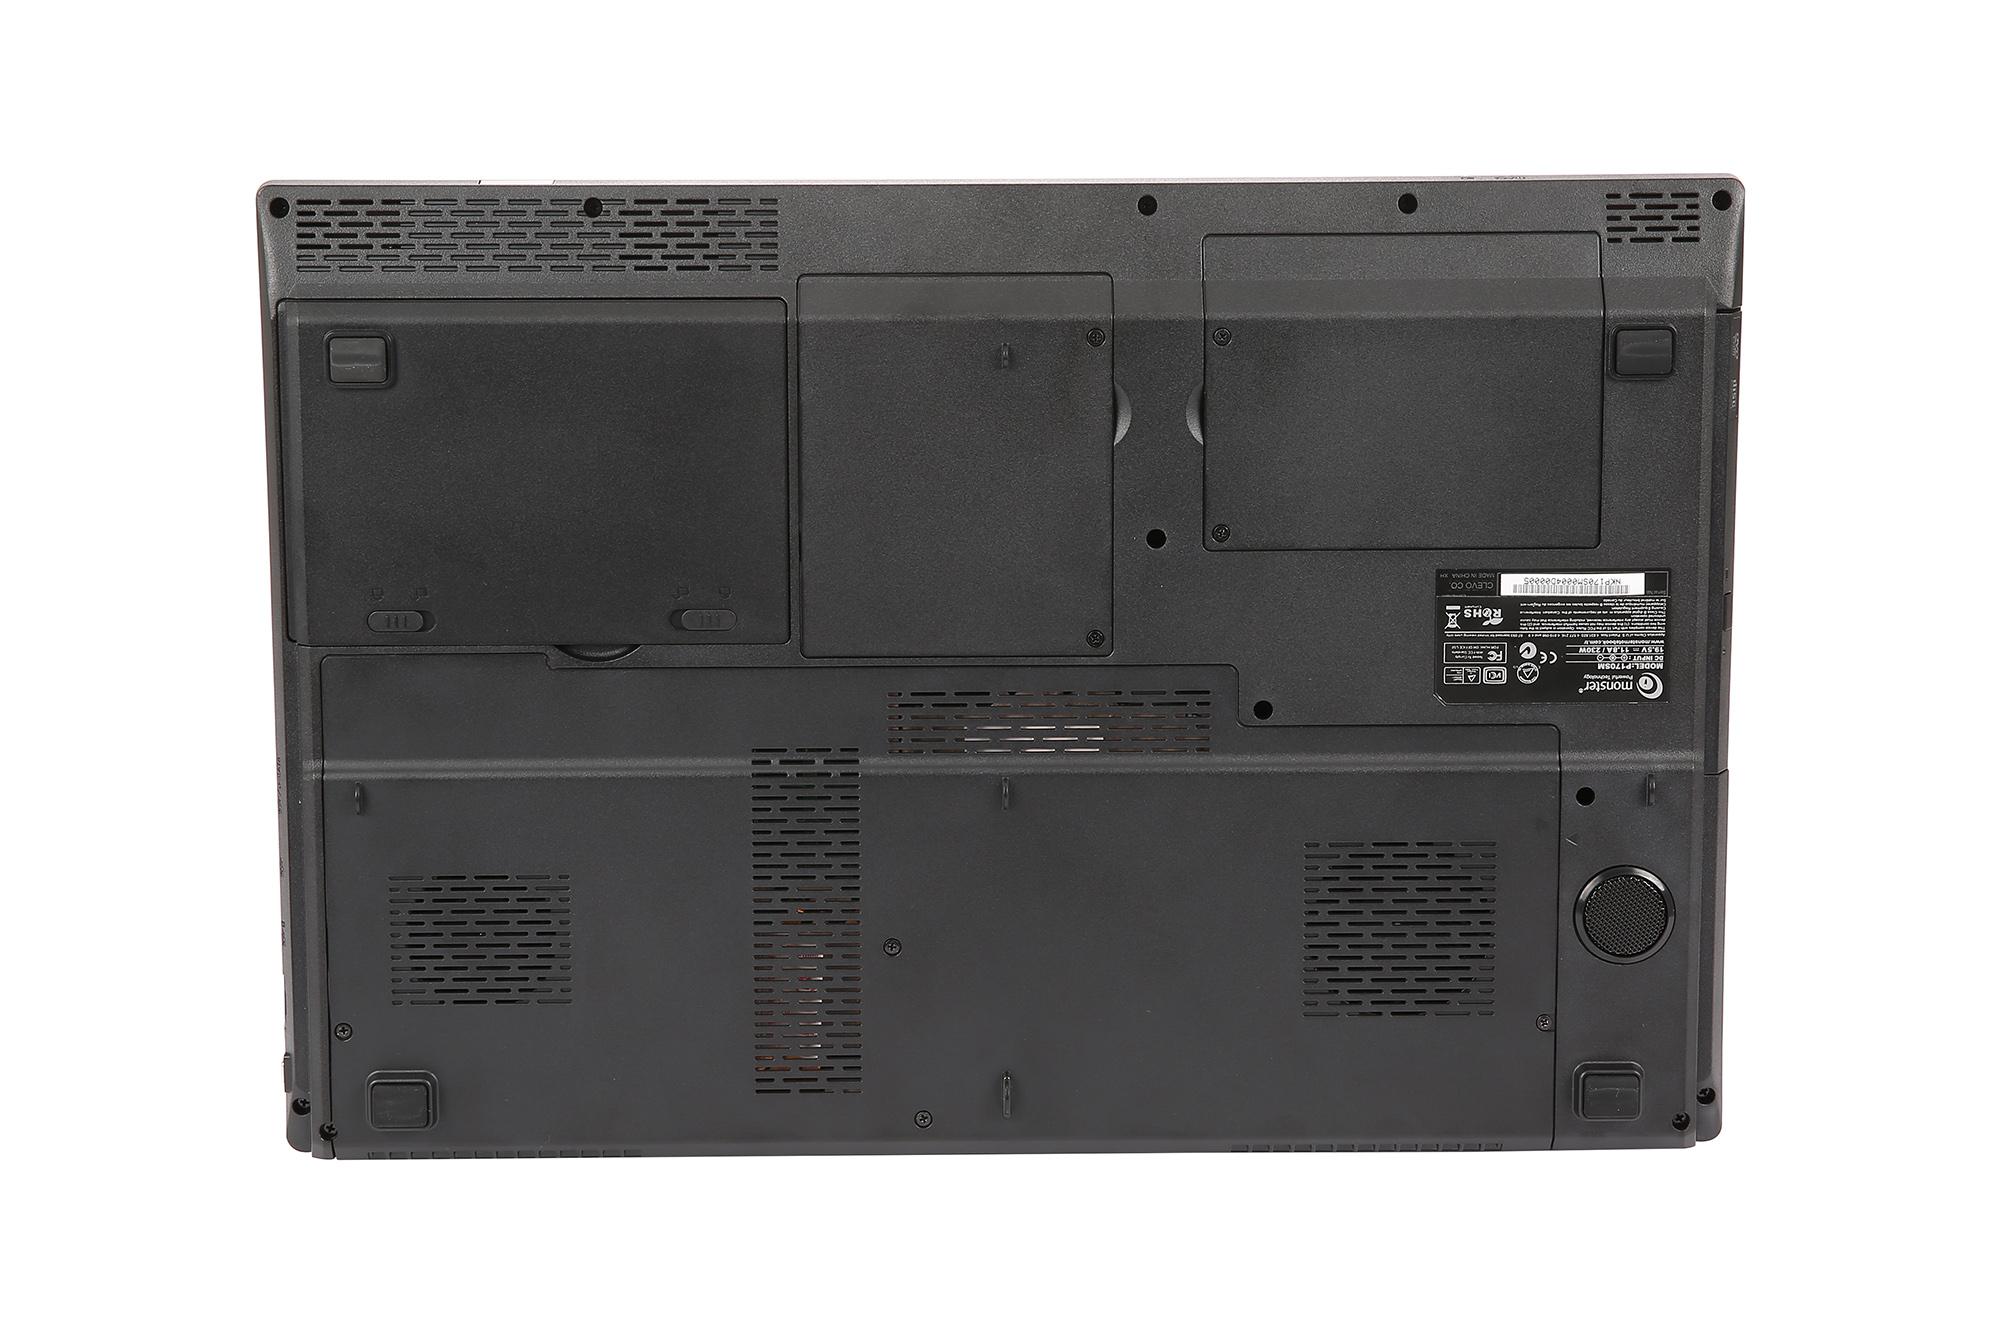 MONSTER® TULPAR T7 V1.2 17.3